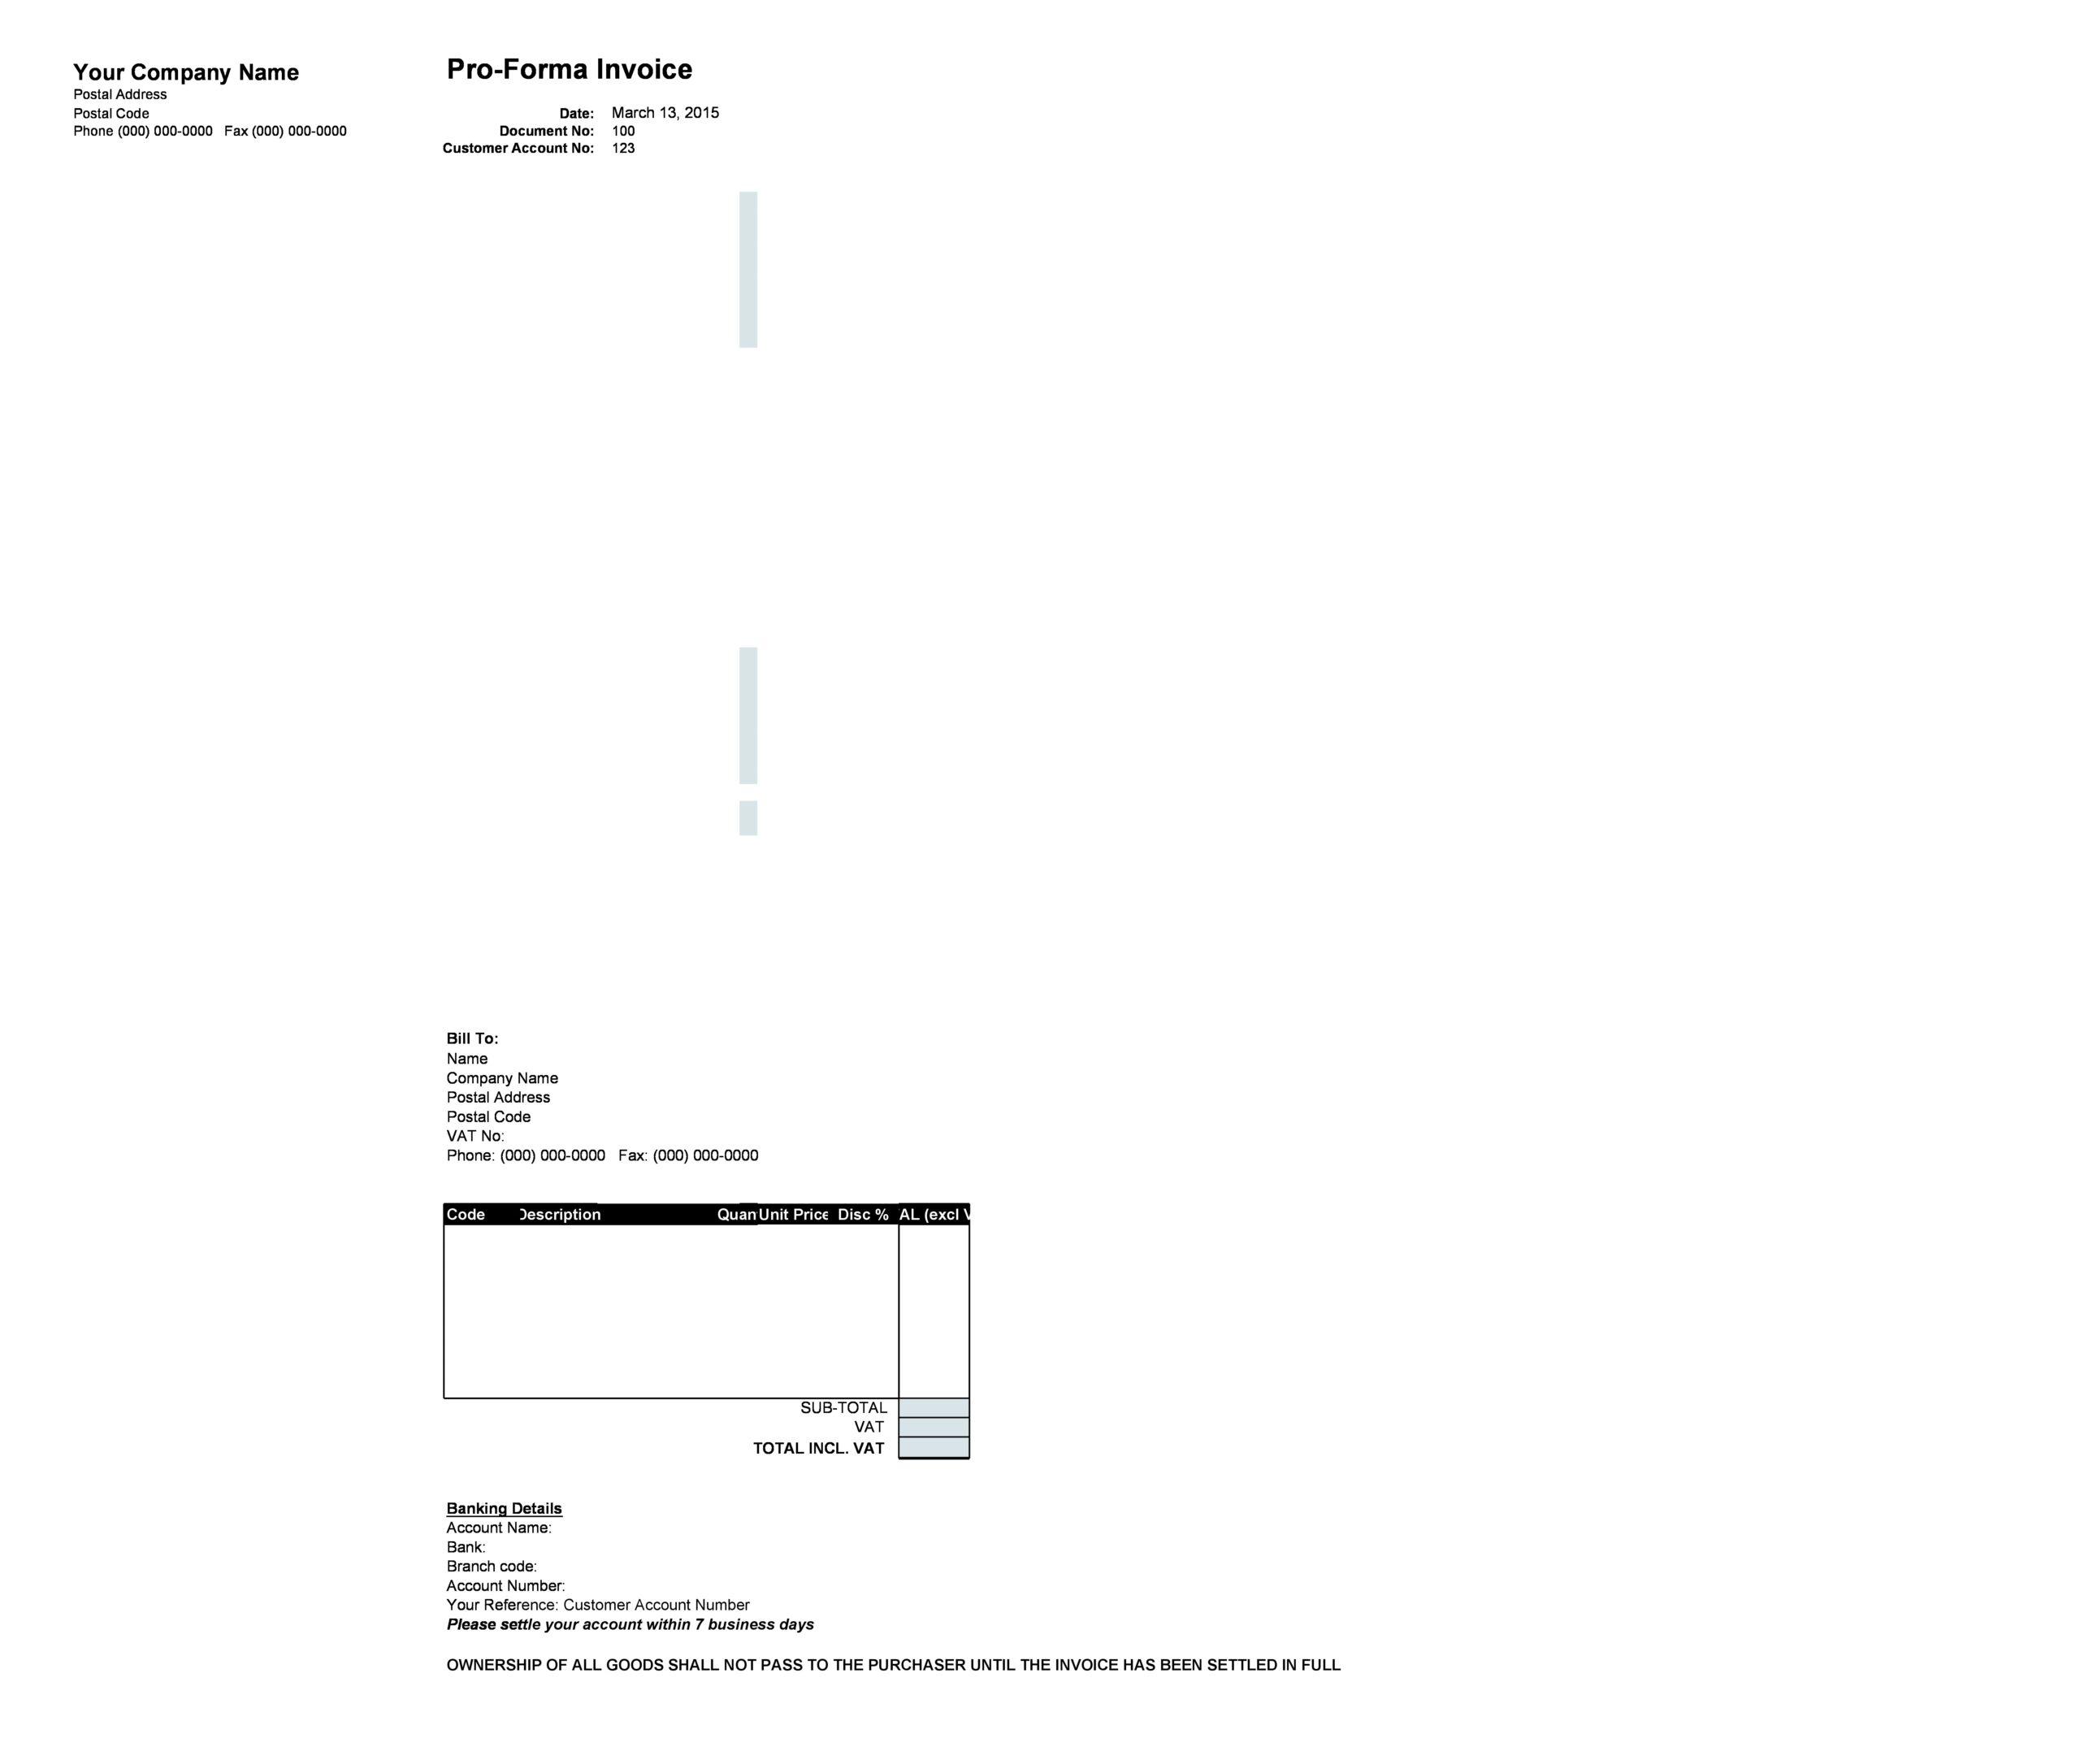 proforma invoice template 04